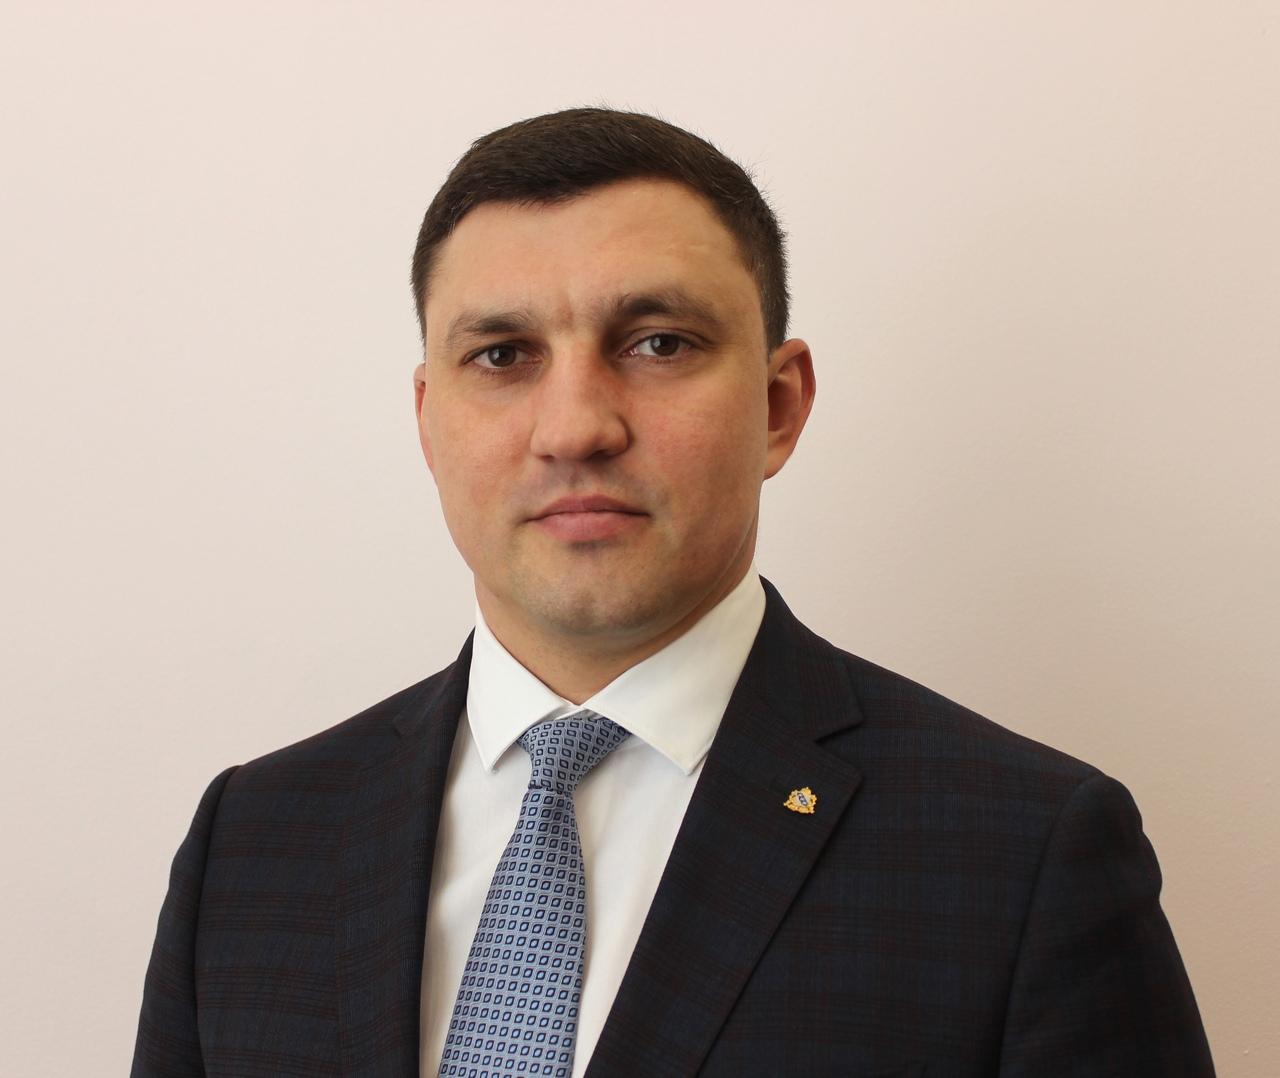 Администрацию губернатора Курской области возглавил Юрий Князев